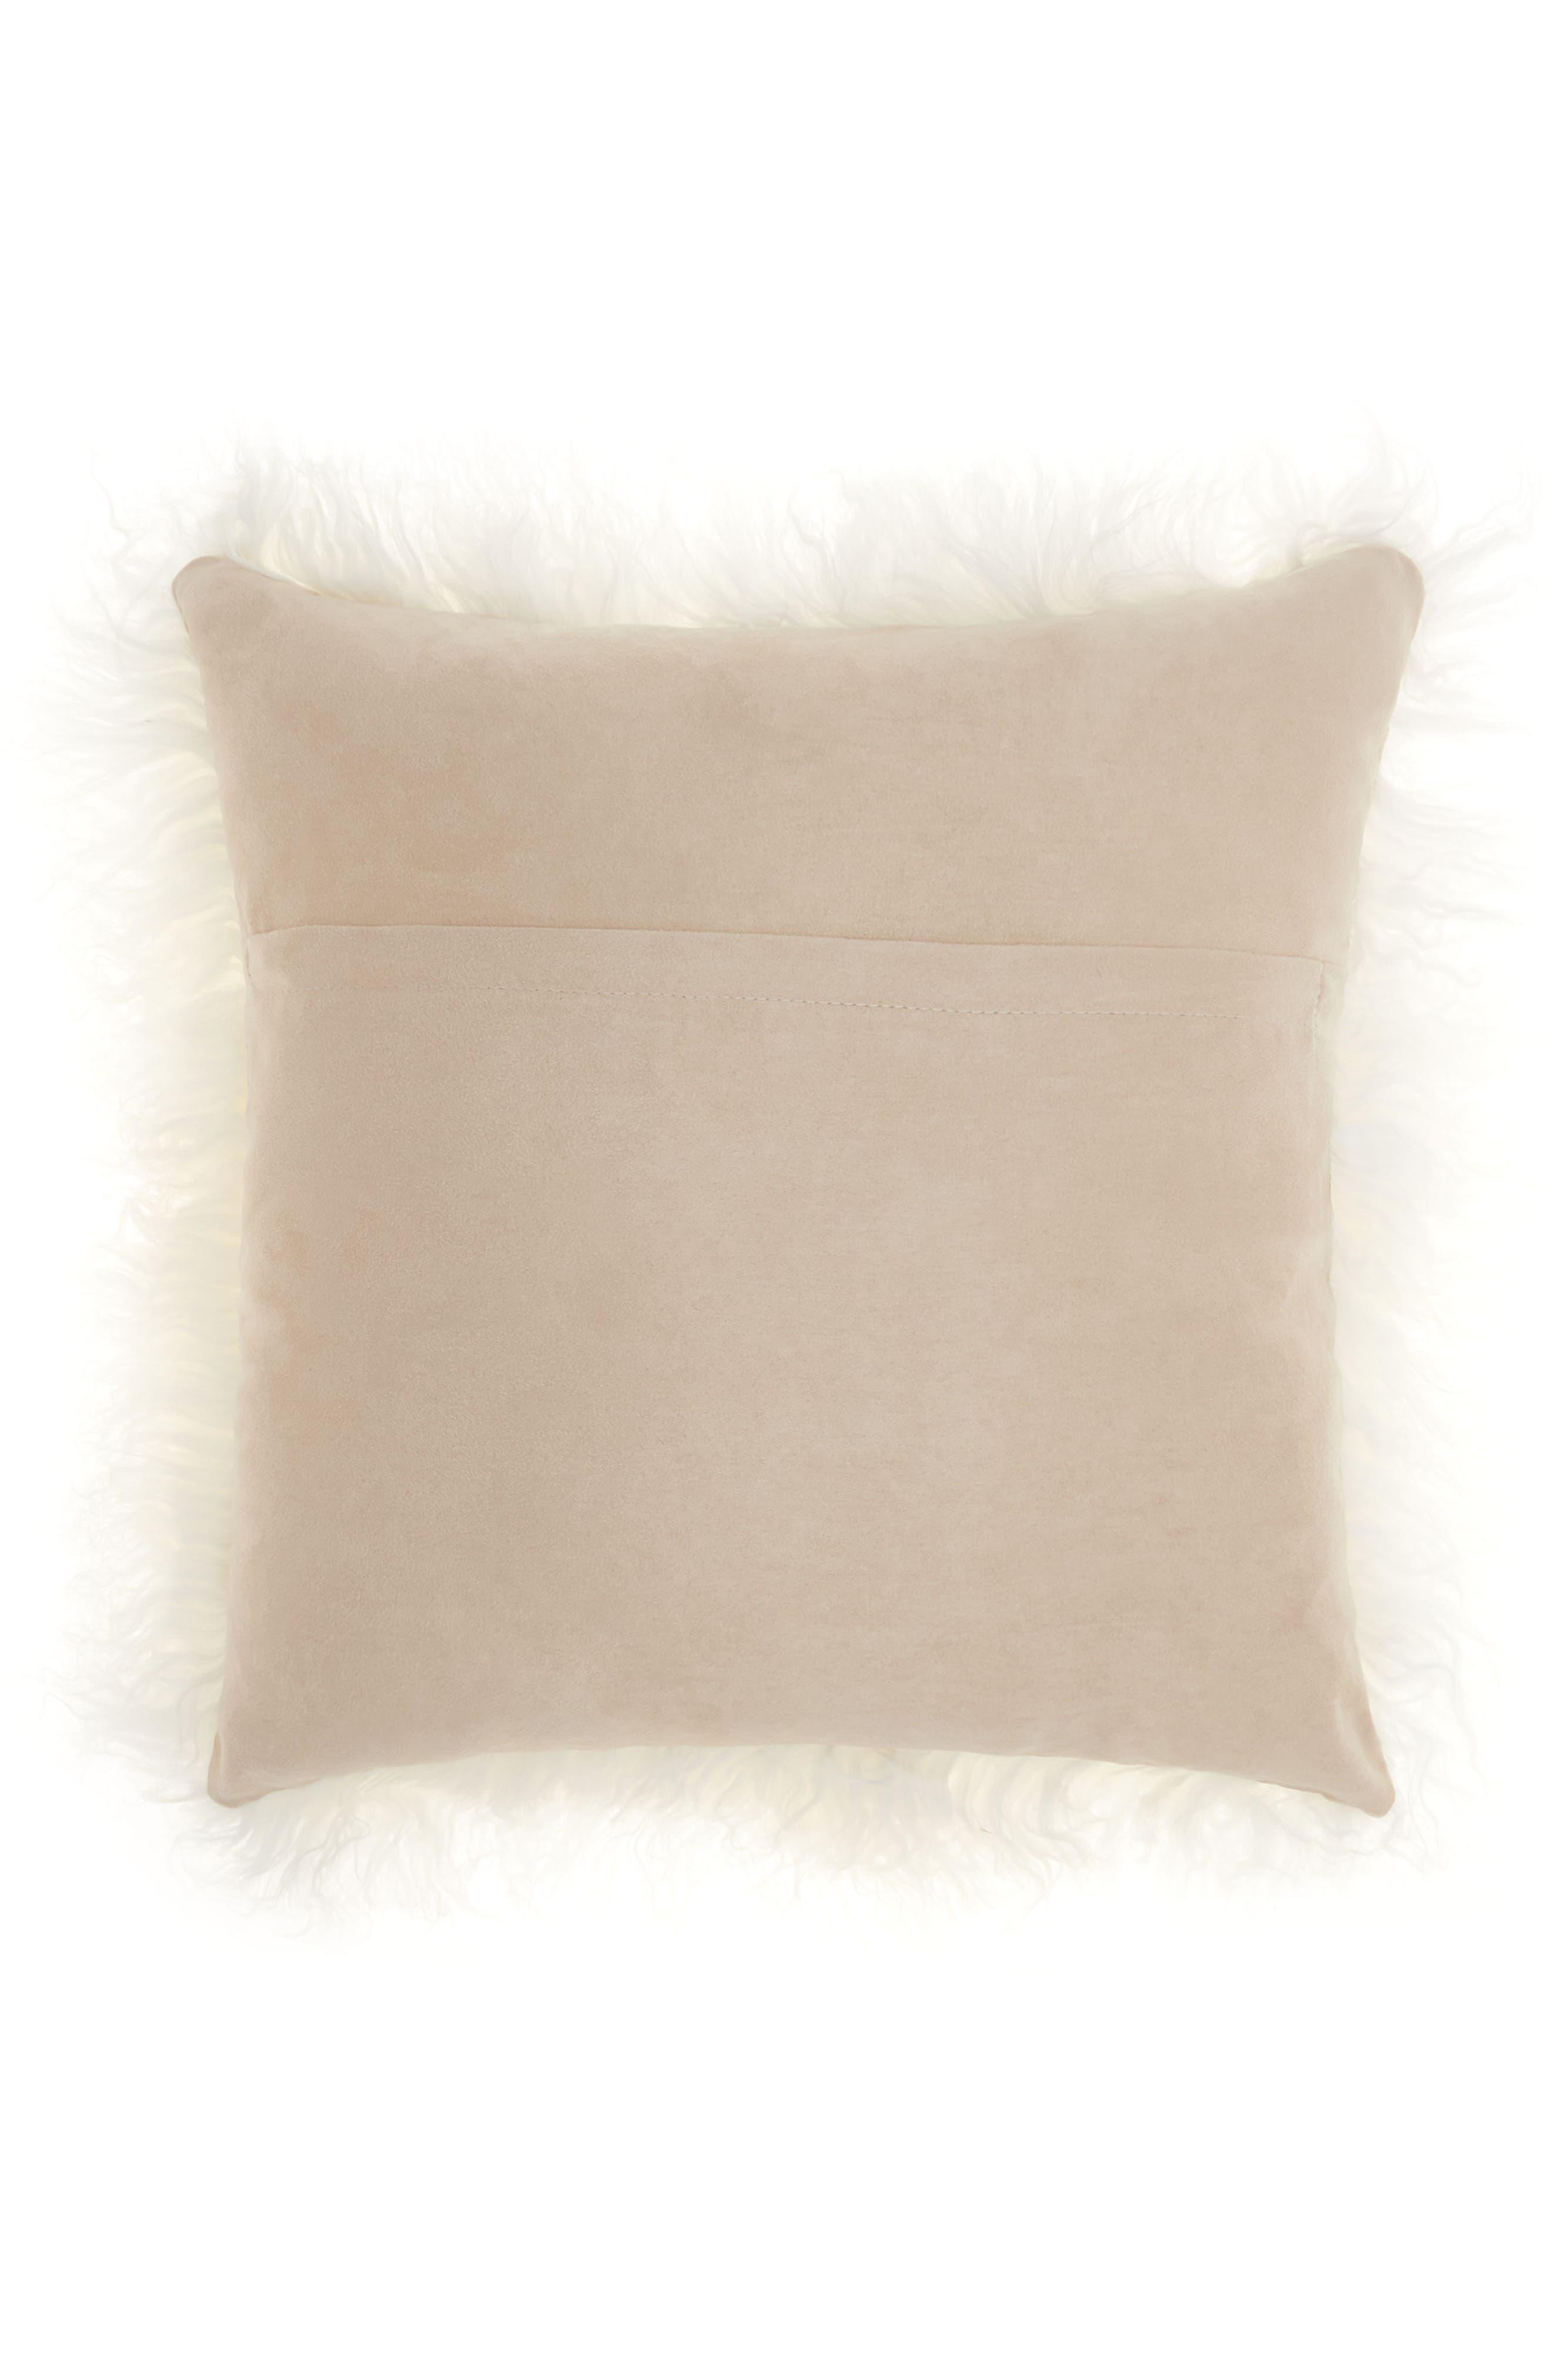 Genuine Tibetan Wool Shearling Pillow,                             Alternate thumbnail 2, color,                             Beige